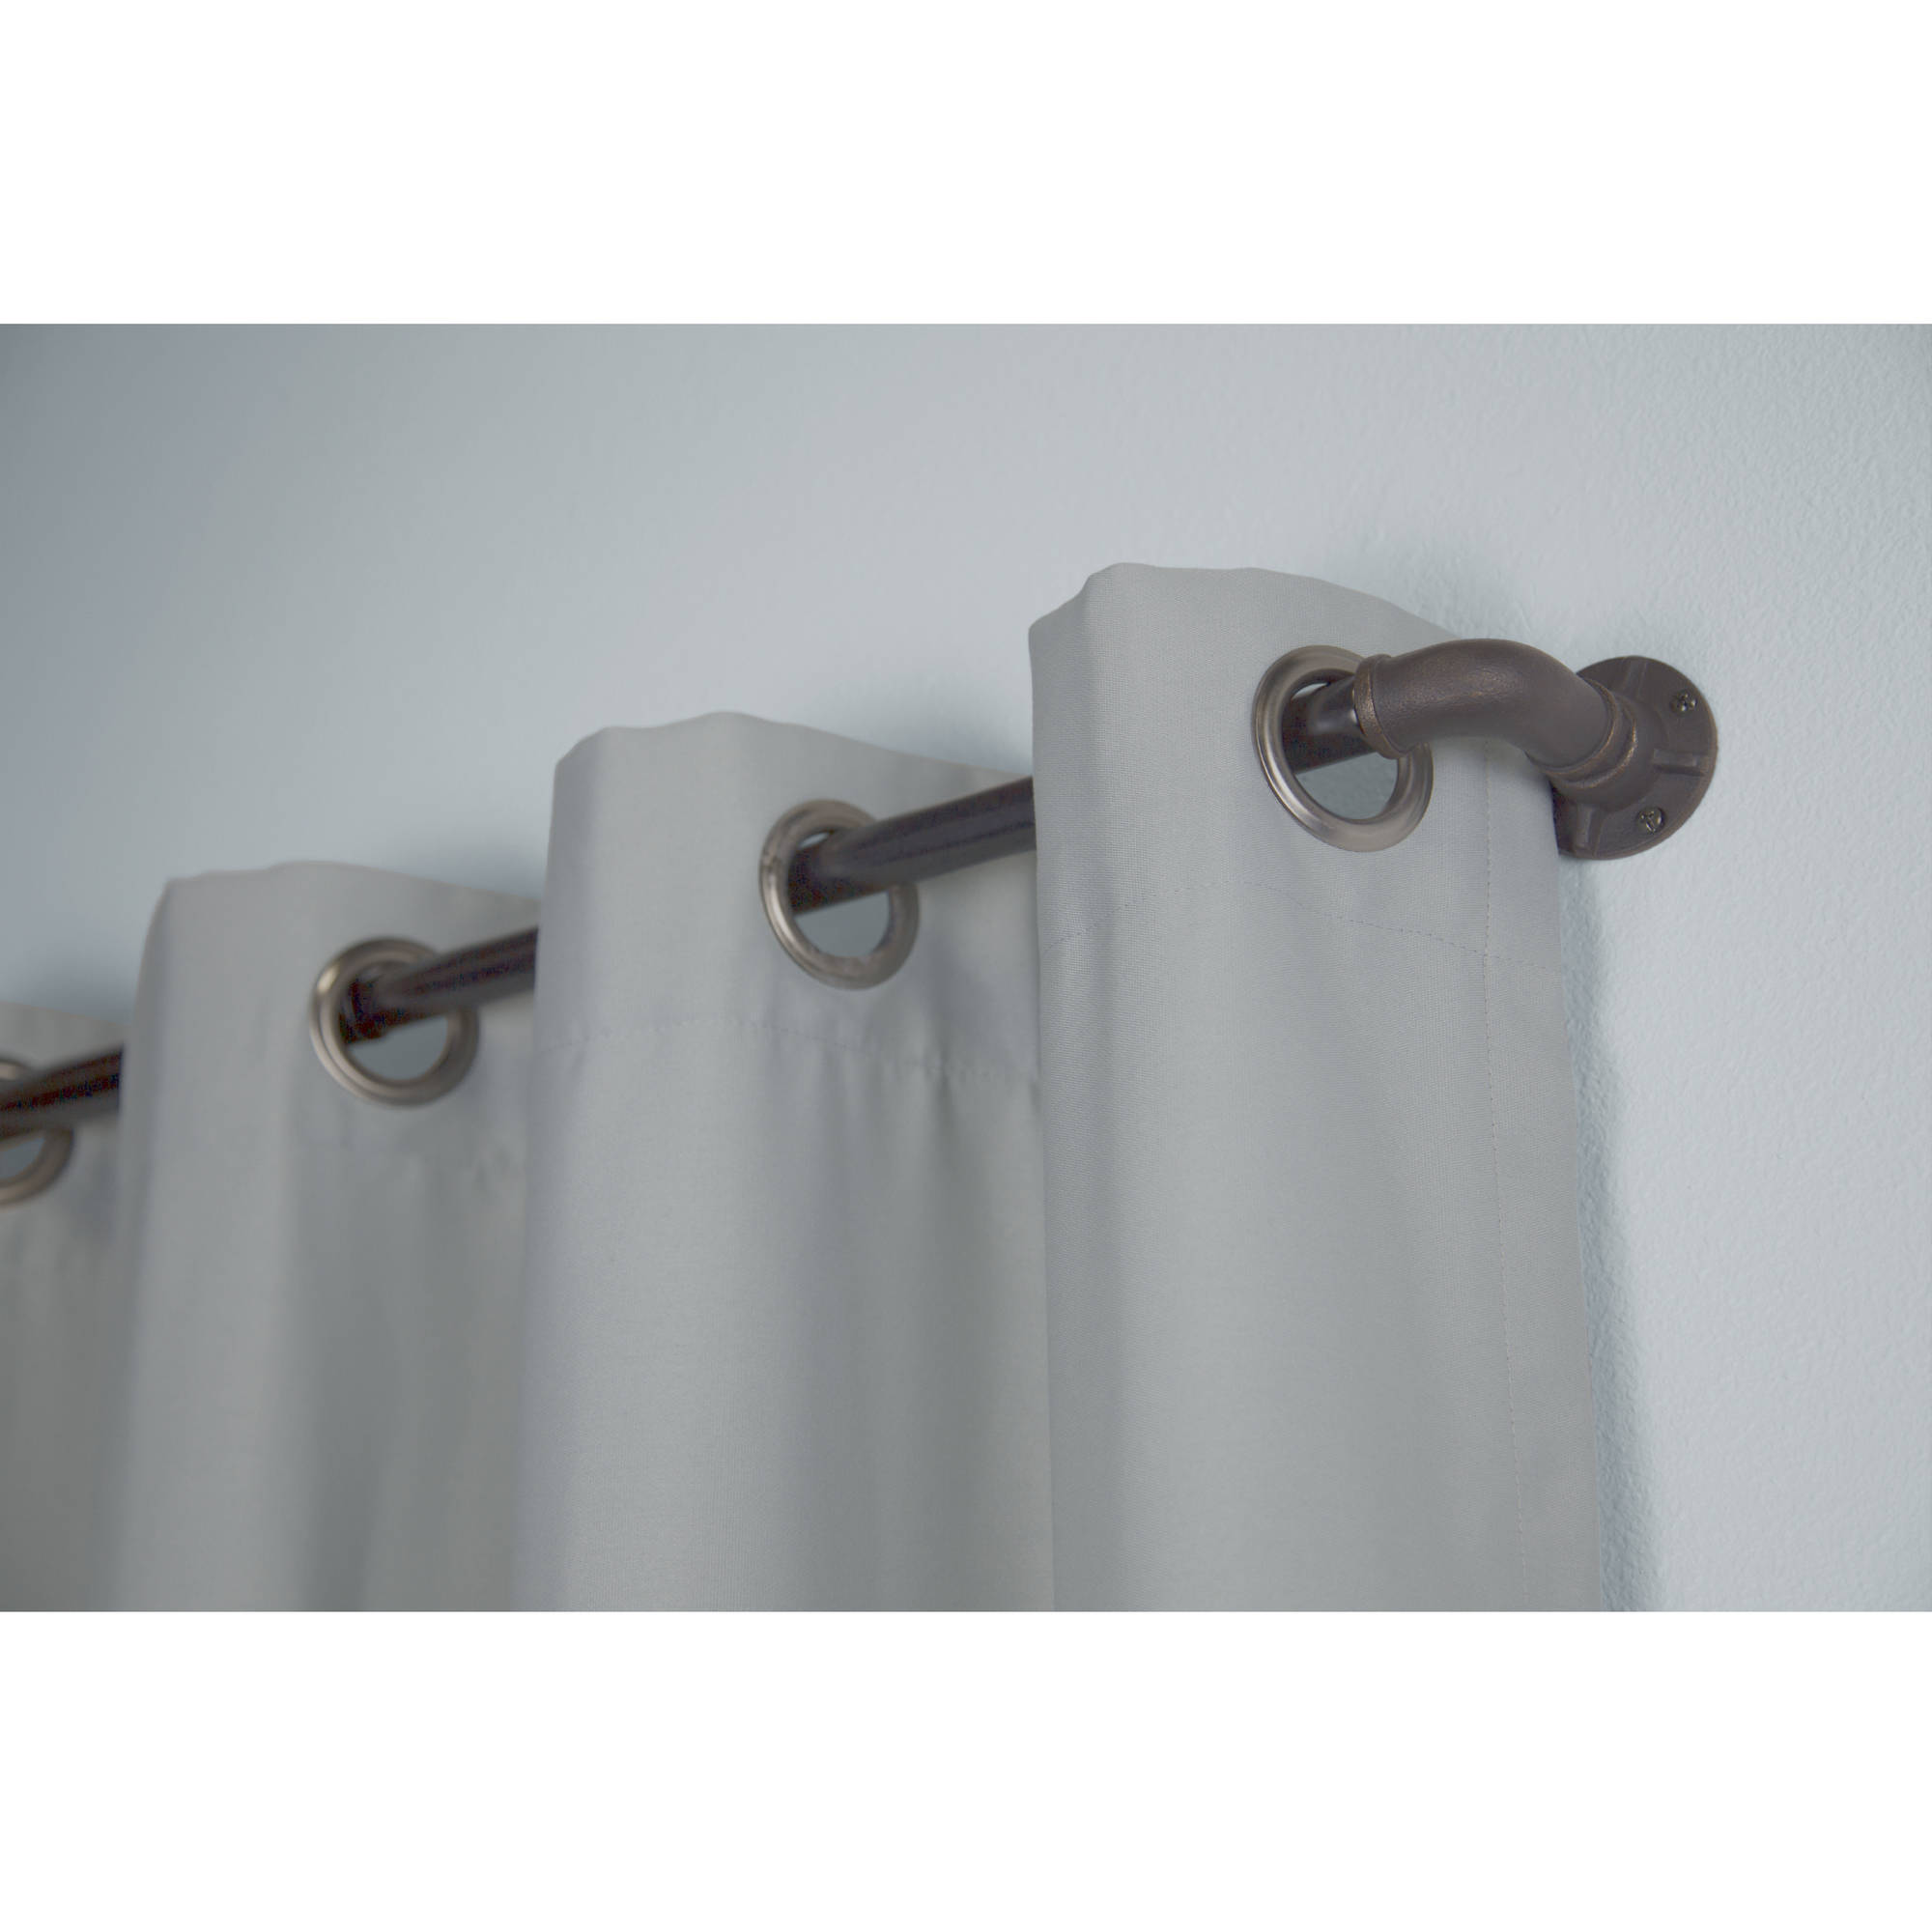 bali 1 industrial curtain rod set 36 66 or 66 120